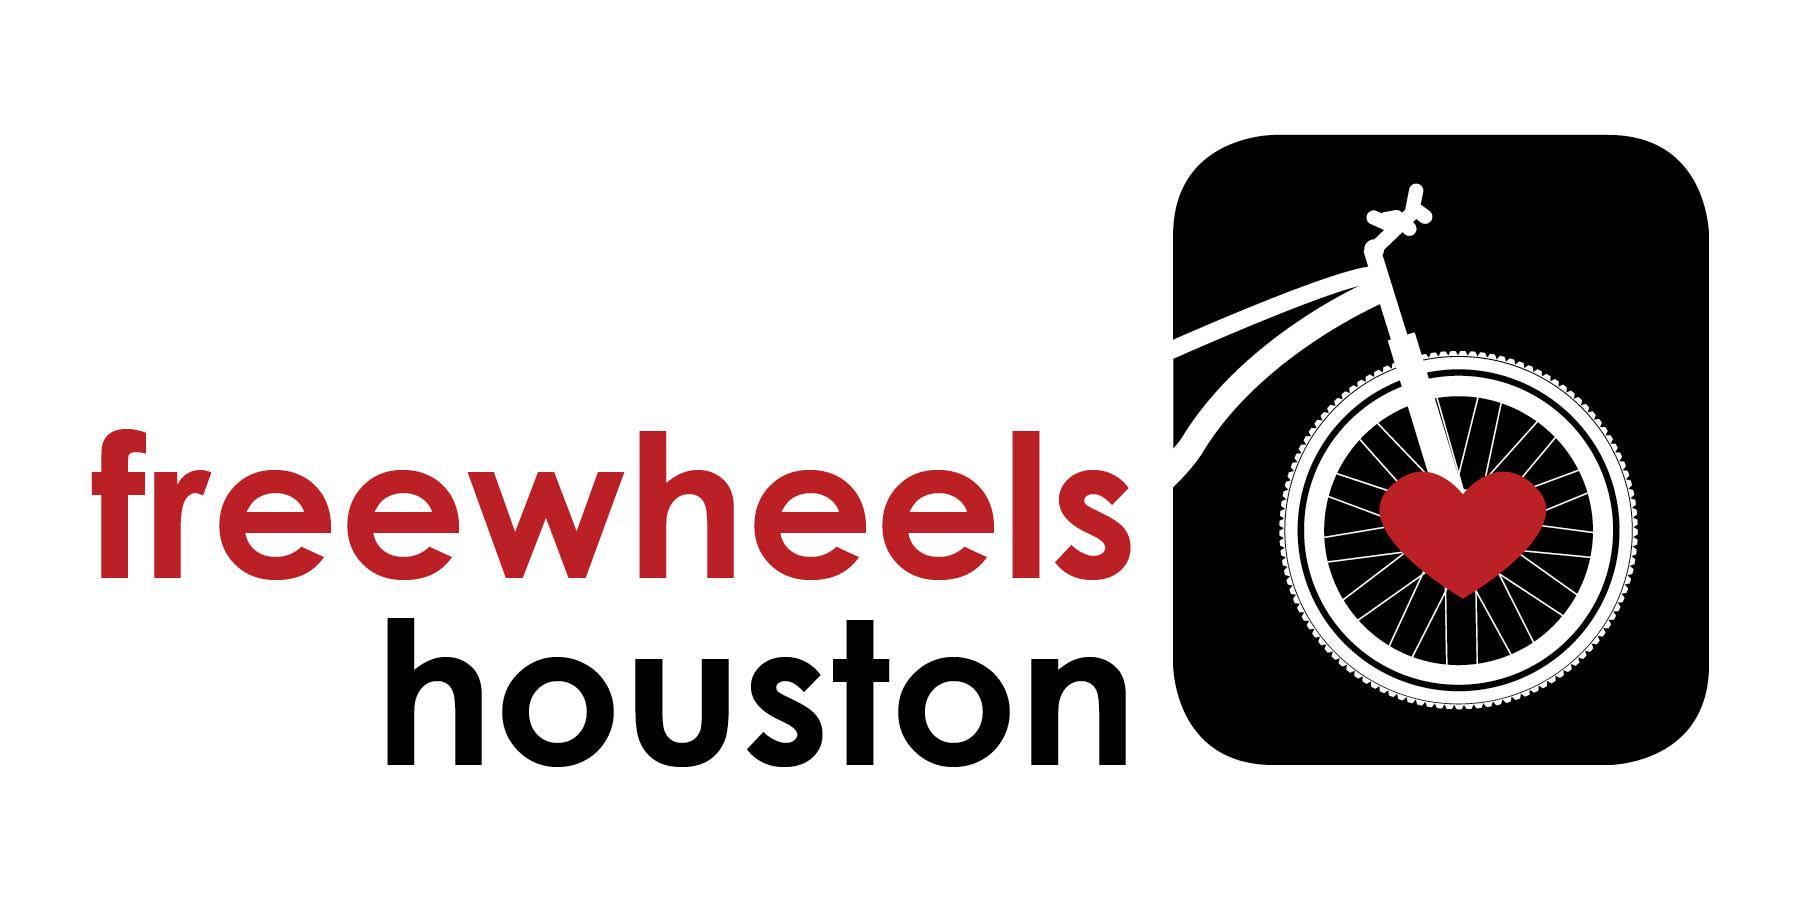 Freewheels Houston - Bicycles for Refugees